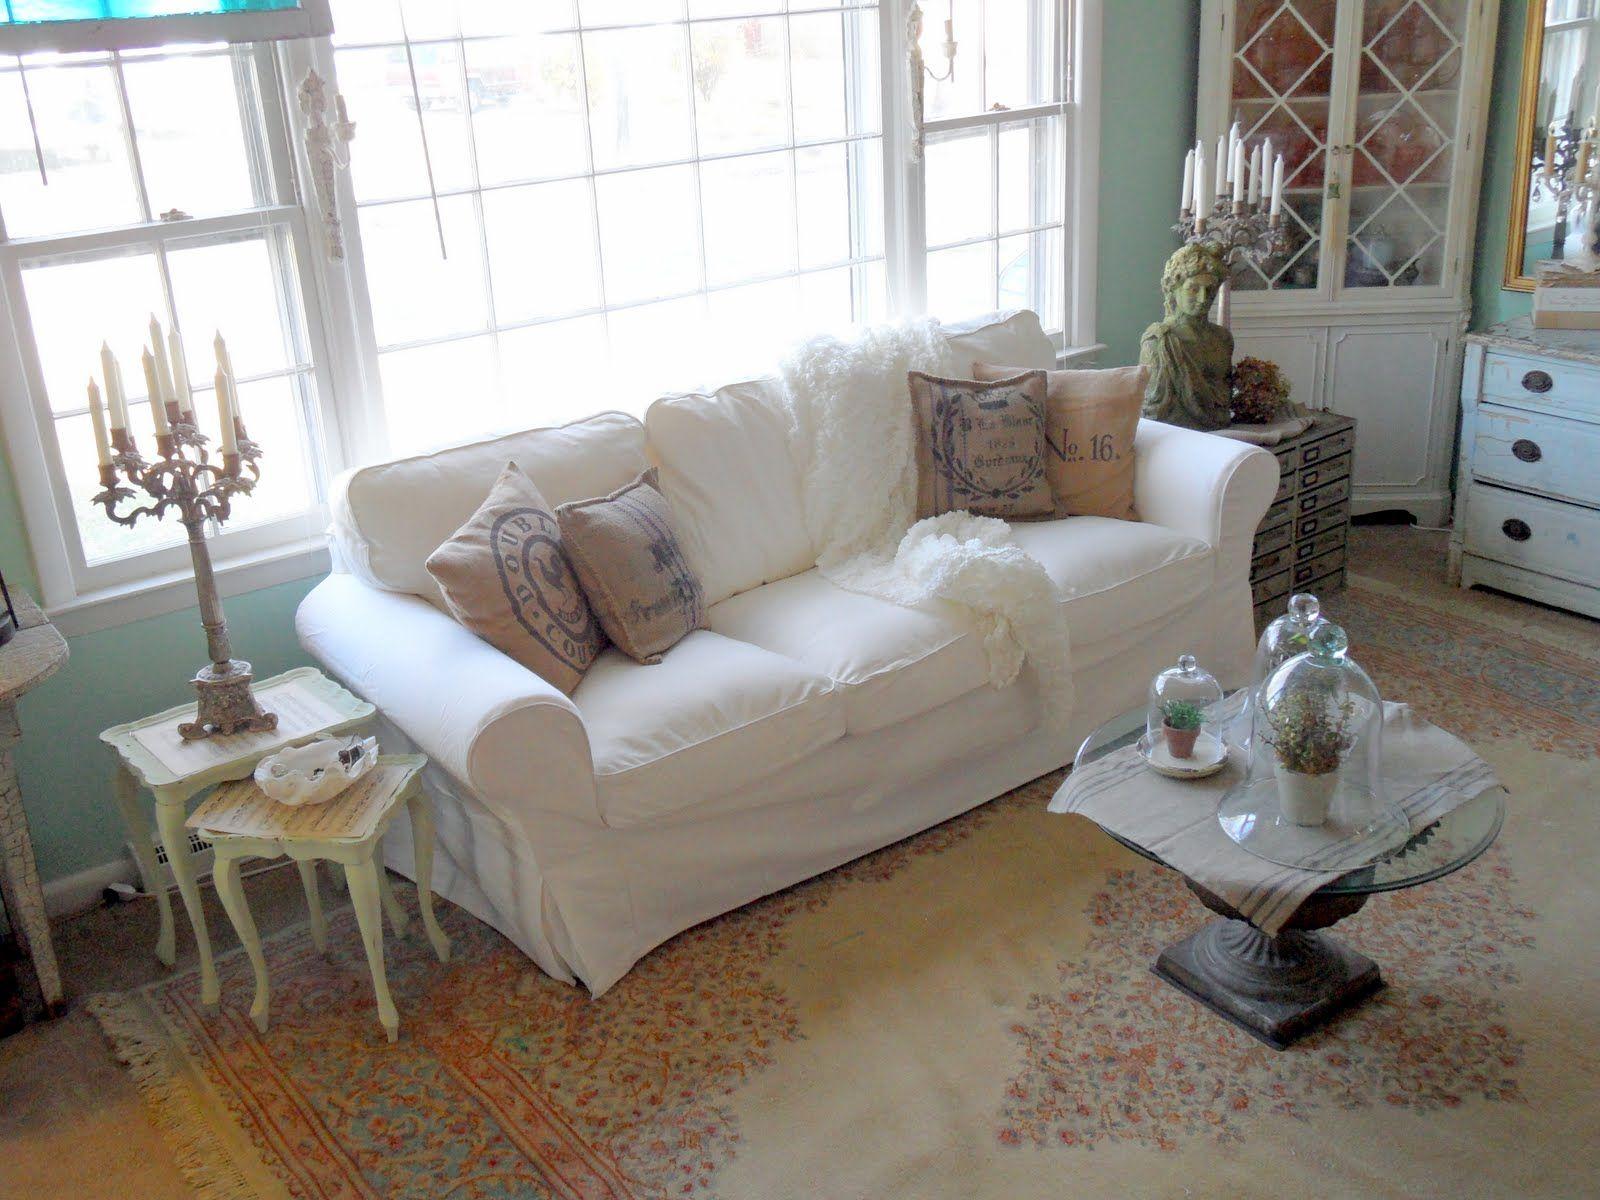 Astounding Ikea Ektorp Blekinge White Sofa Google Search Ektorp Ocoug Best Dining Table And Chair Ideas Images Ocougorg